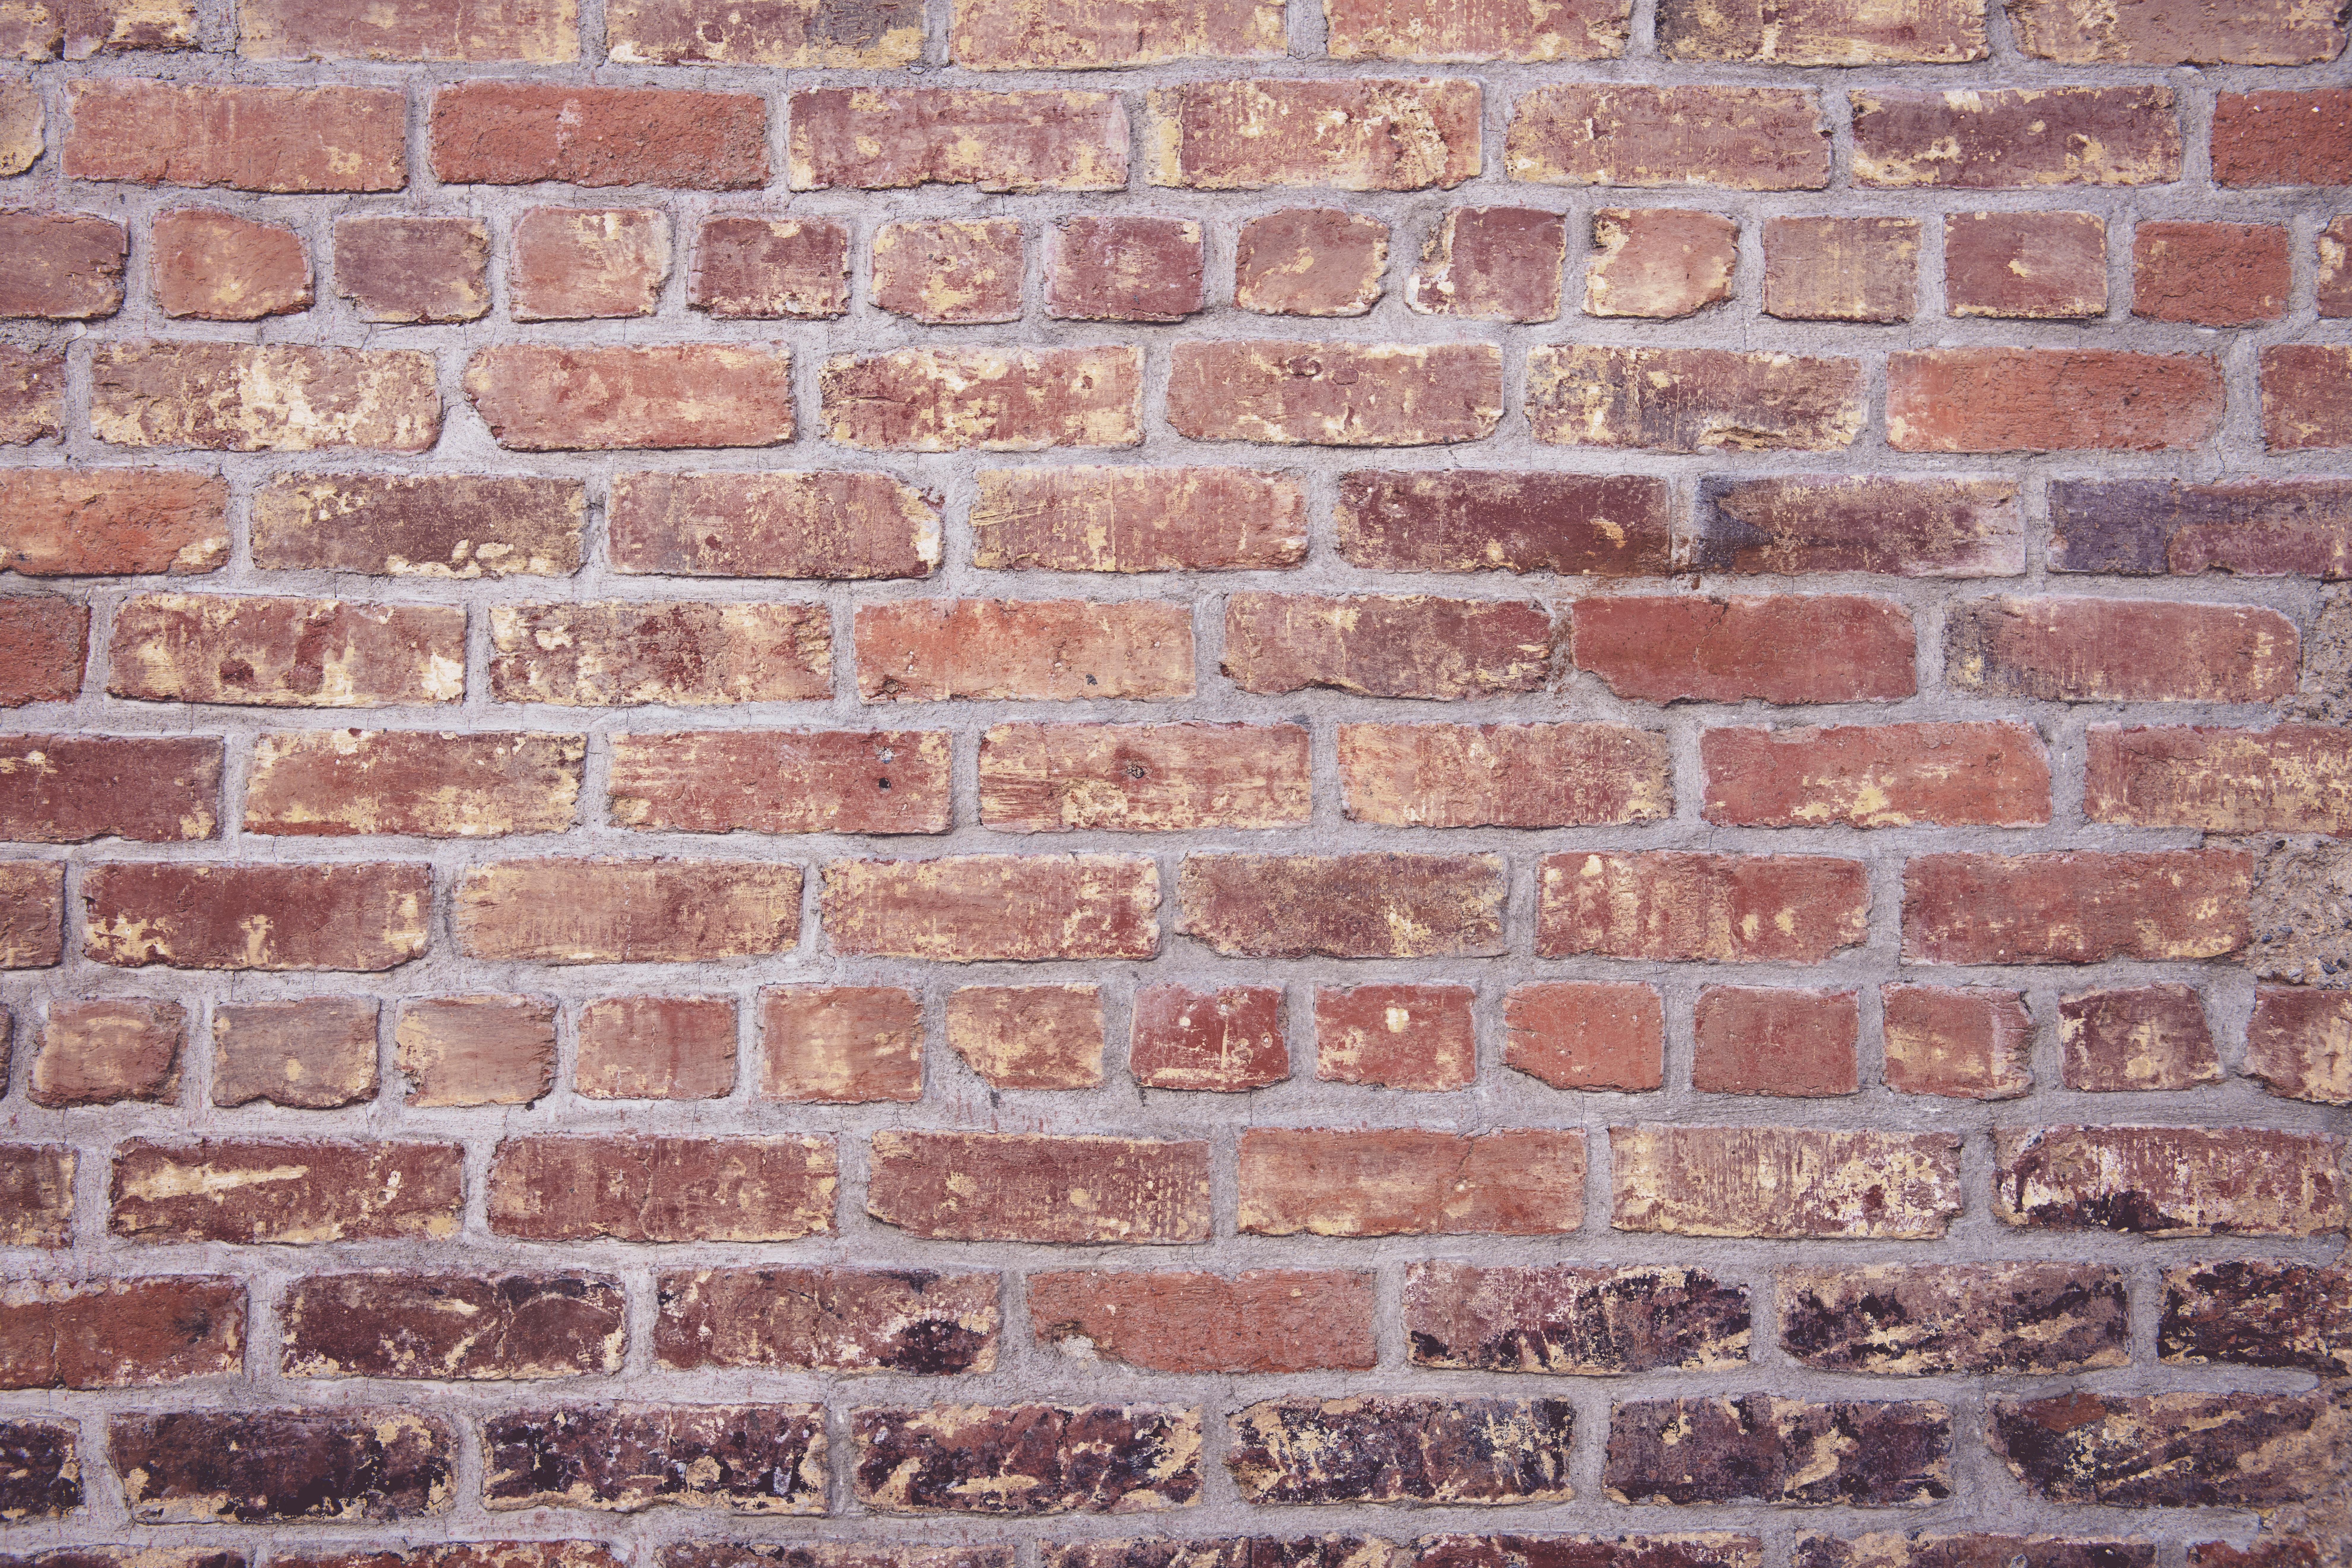 Cloud Brick Wall